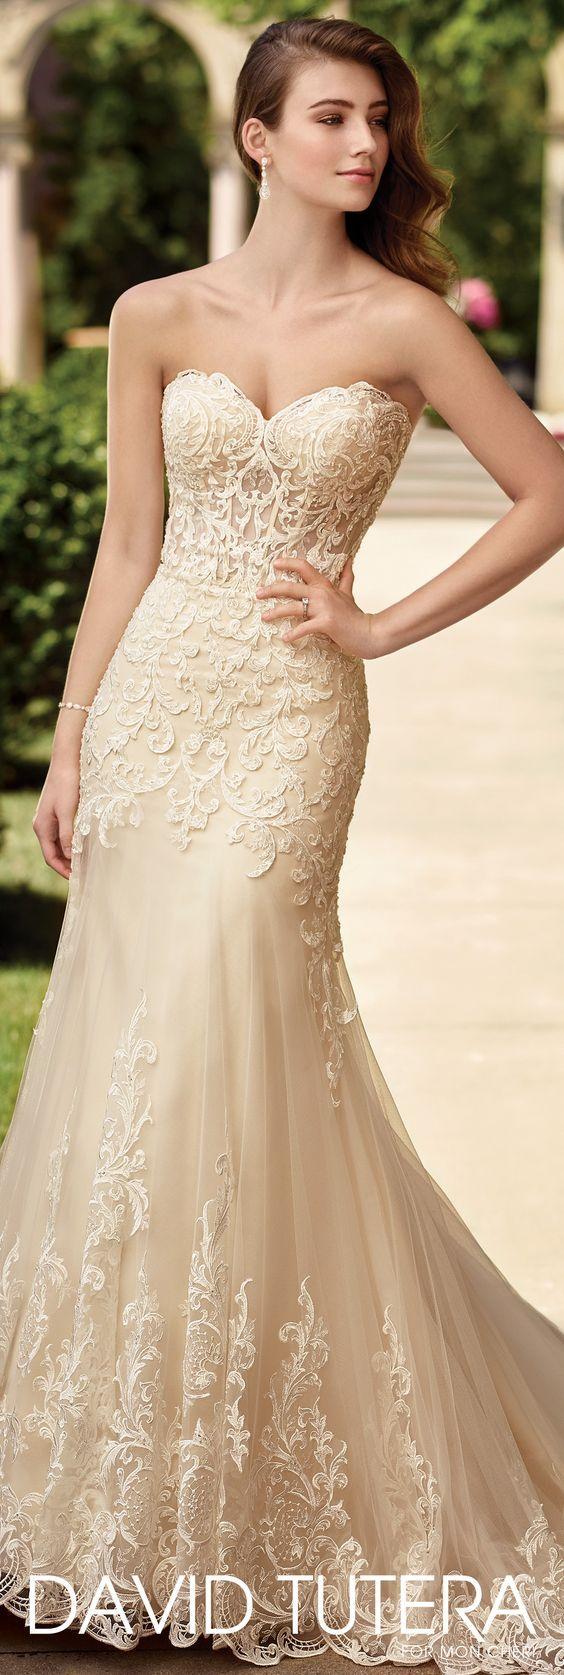 Wedding Dress by David Tutera for Mon Cheri 2017 Bridal Collection | Style No. » 117278 Oria